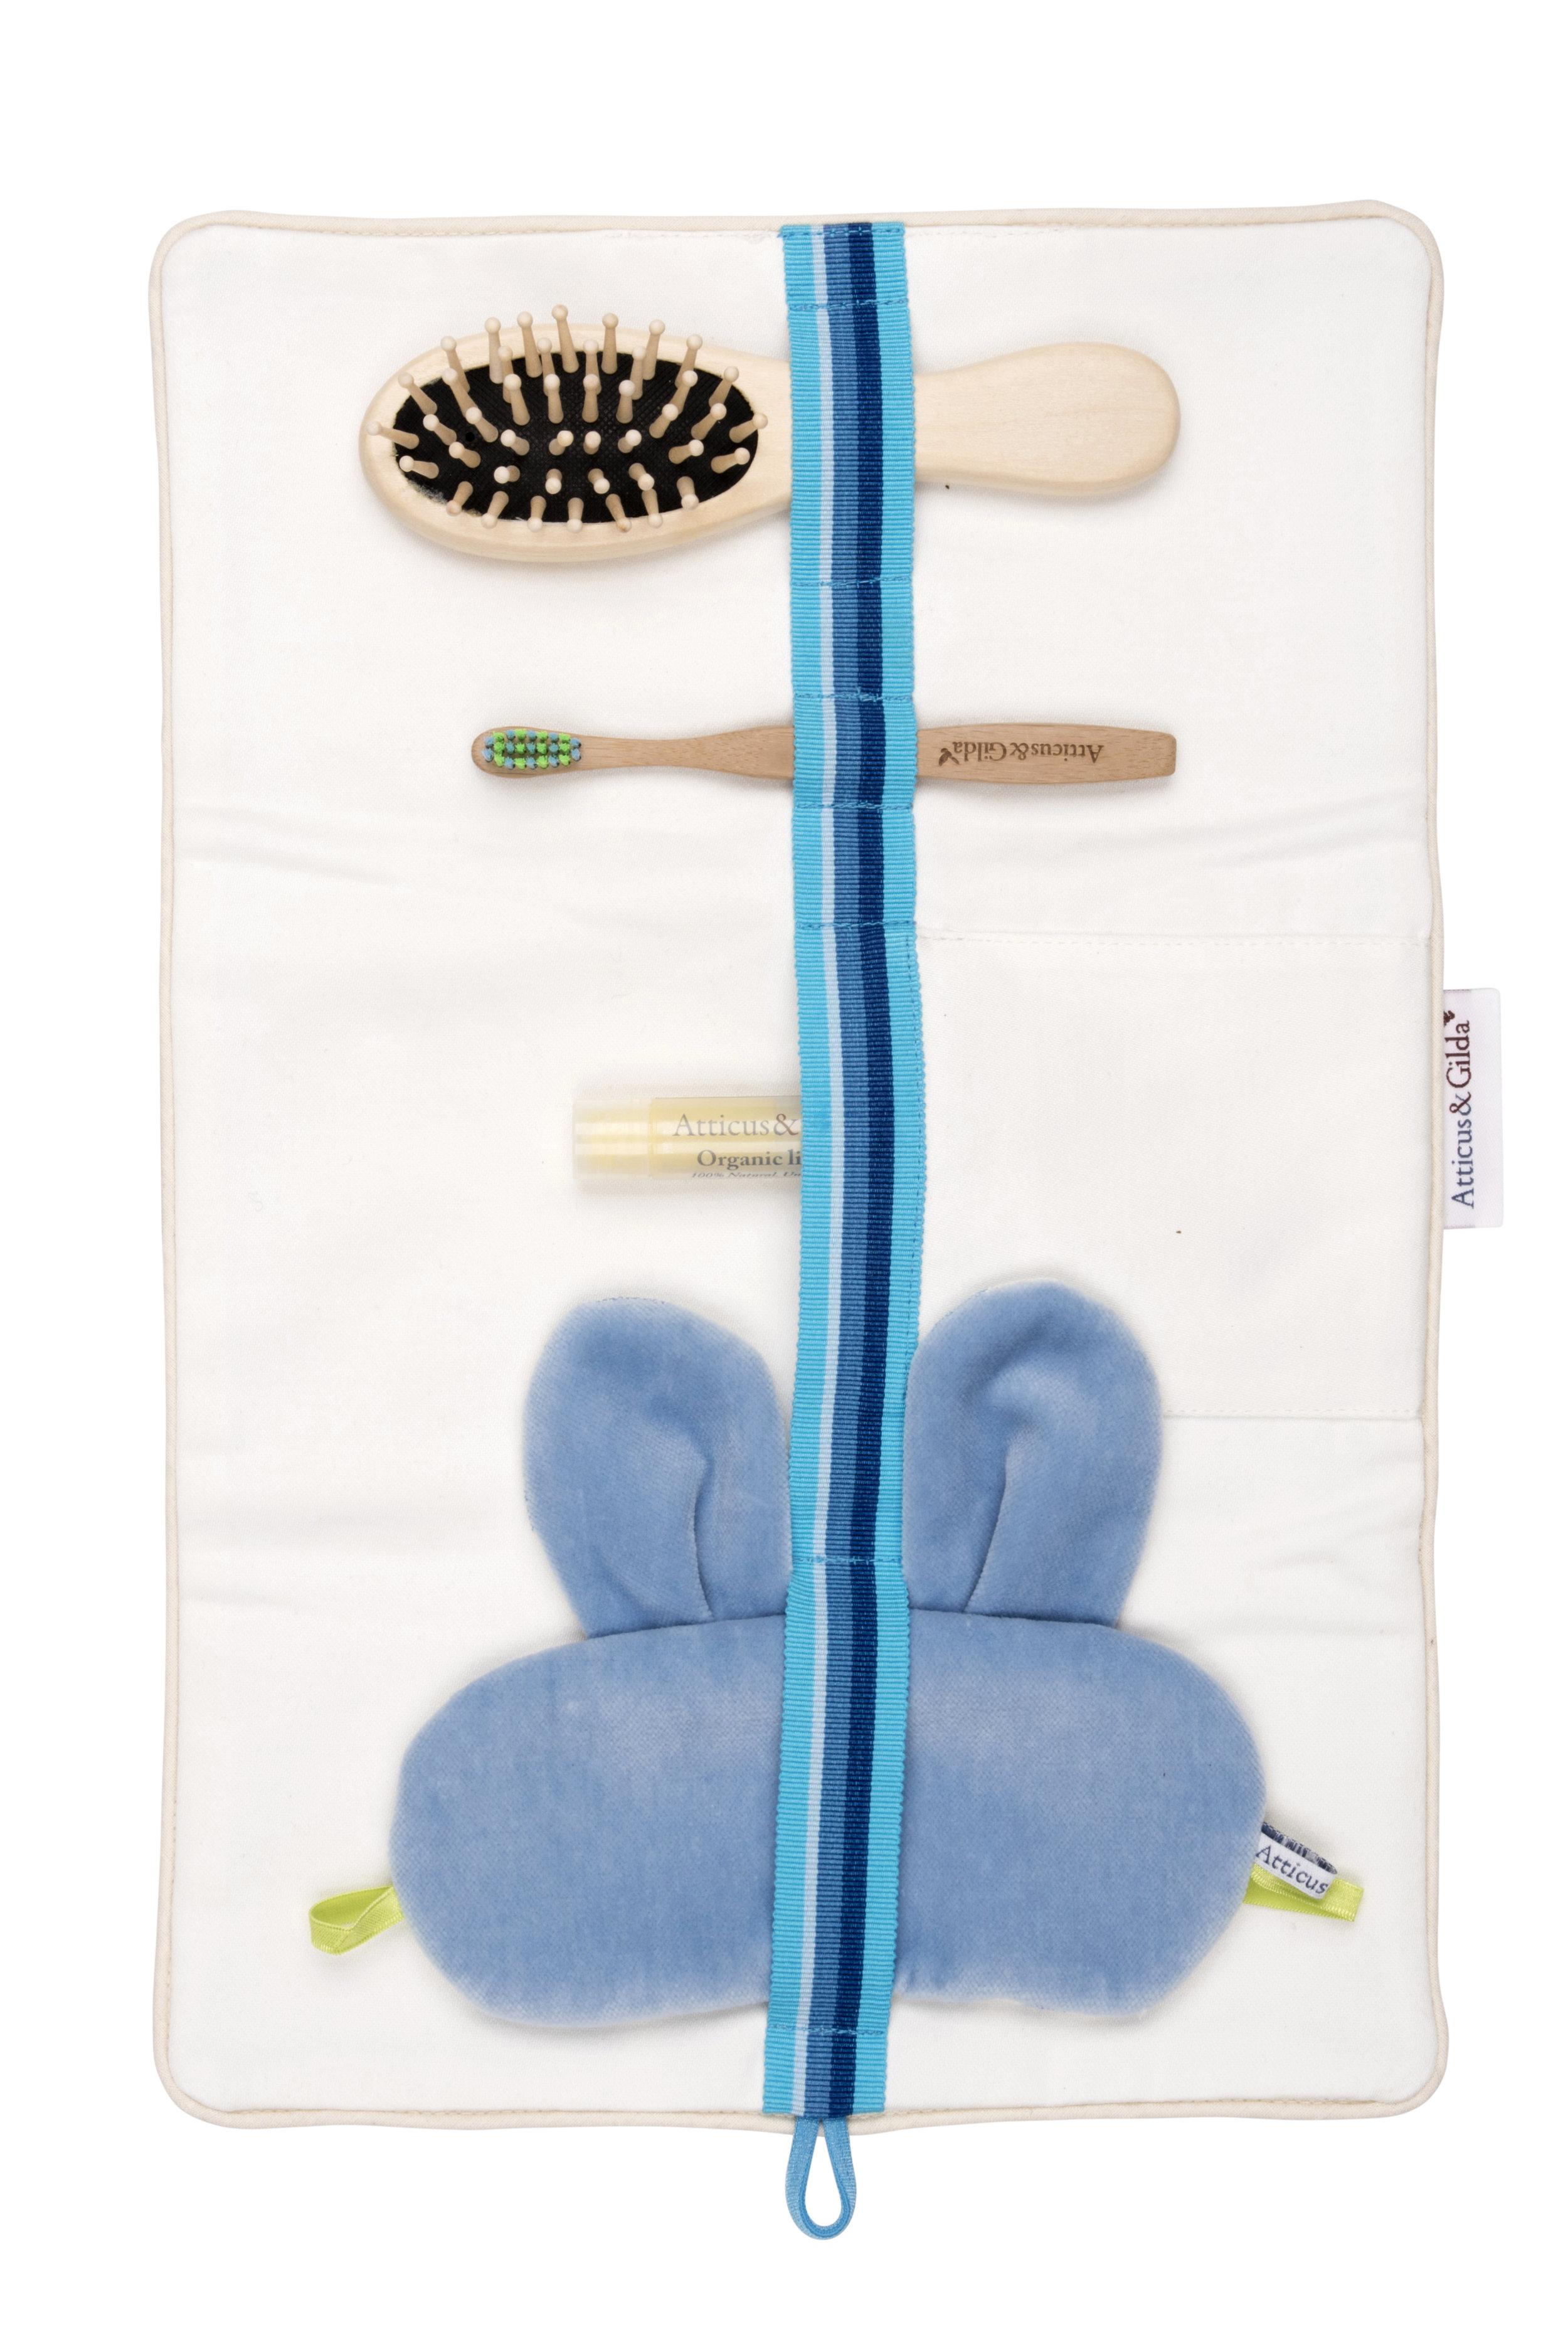 Atticus and Gilda cotton overnight bag with brush, toothbrush, lip balm and sleep mask